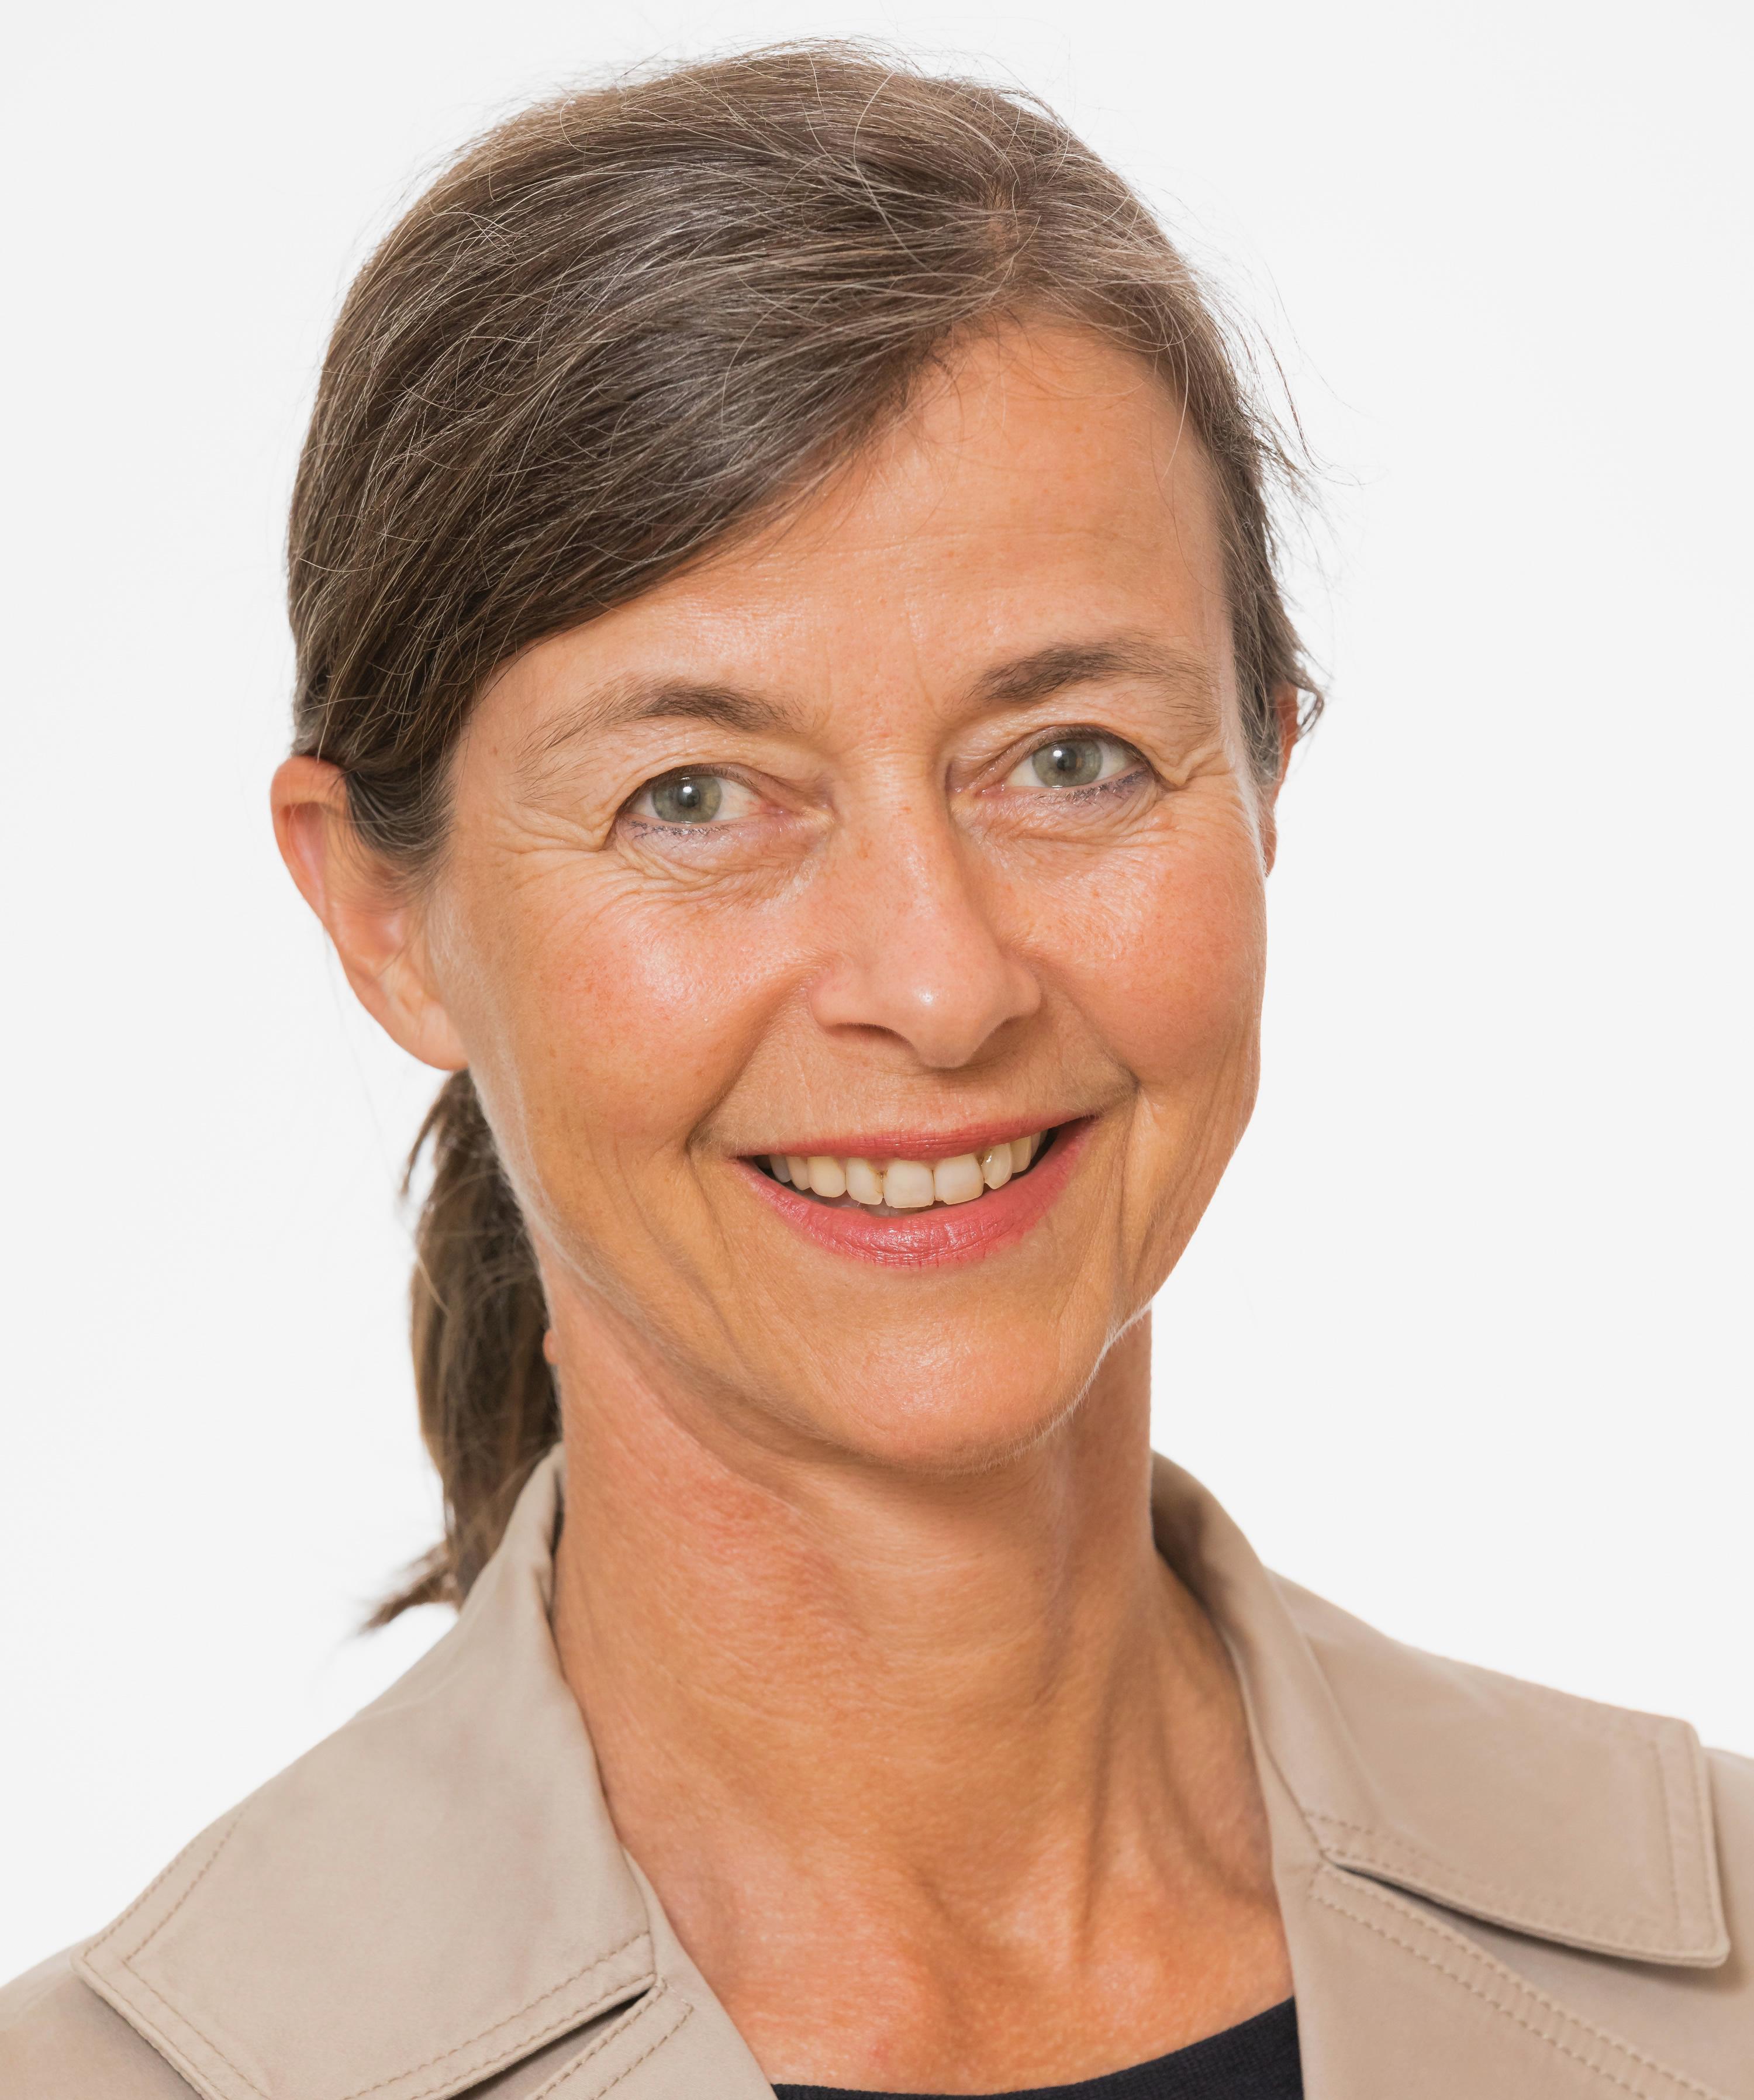 Monika Rueegg